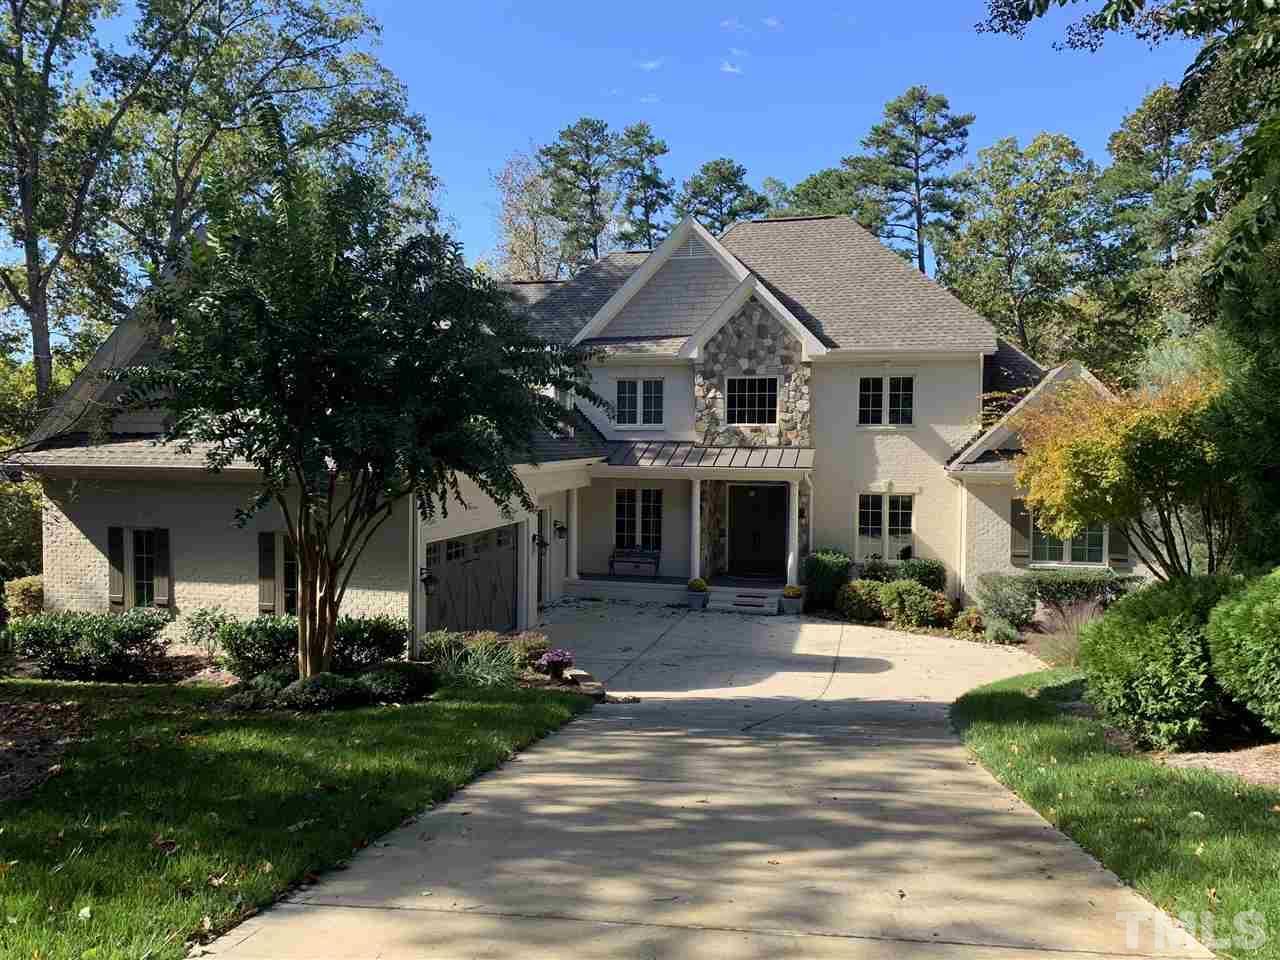 90005 Hoey, Chapel Hill, NC 27517